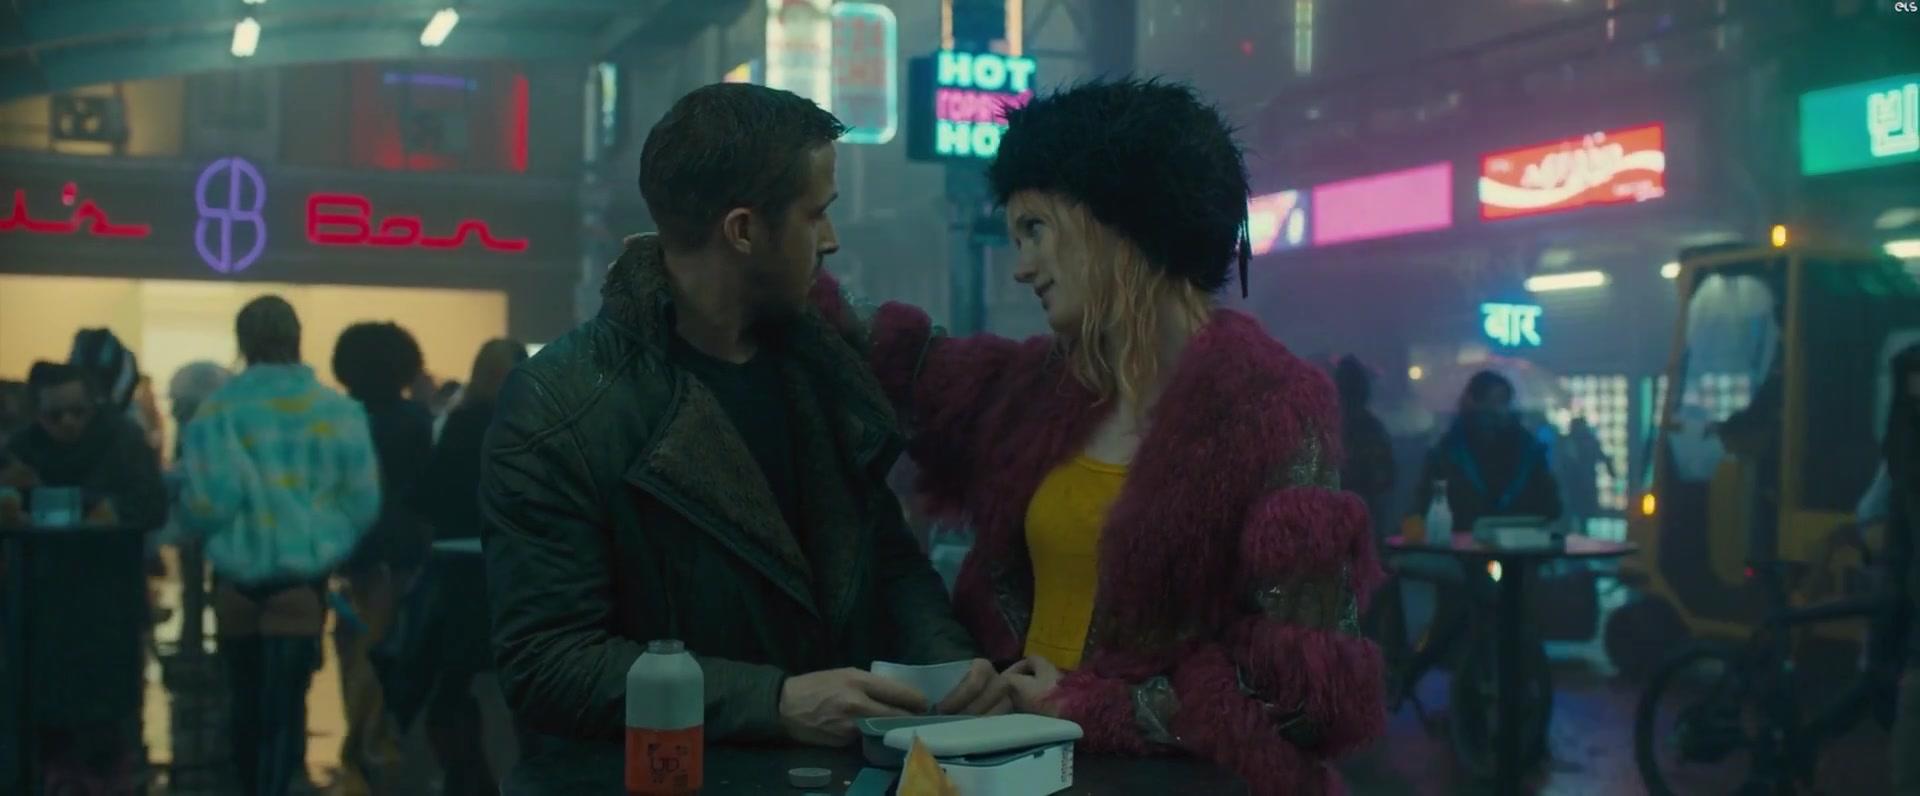 Elarica Johnson, Krista Kosonen and Mackenzie Davis prostitutes for Ryan Gosling